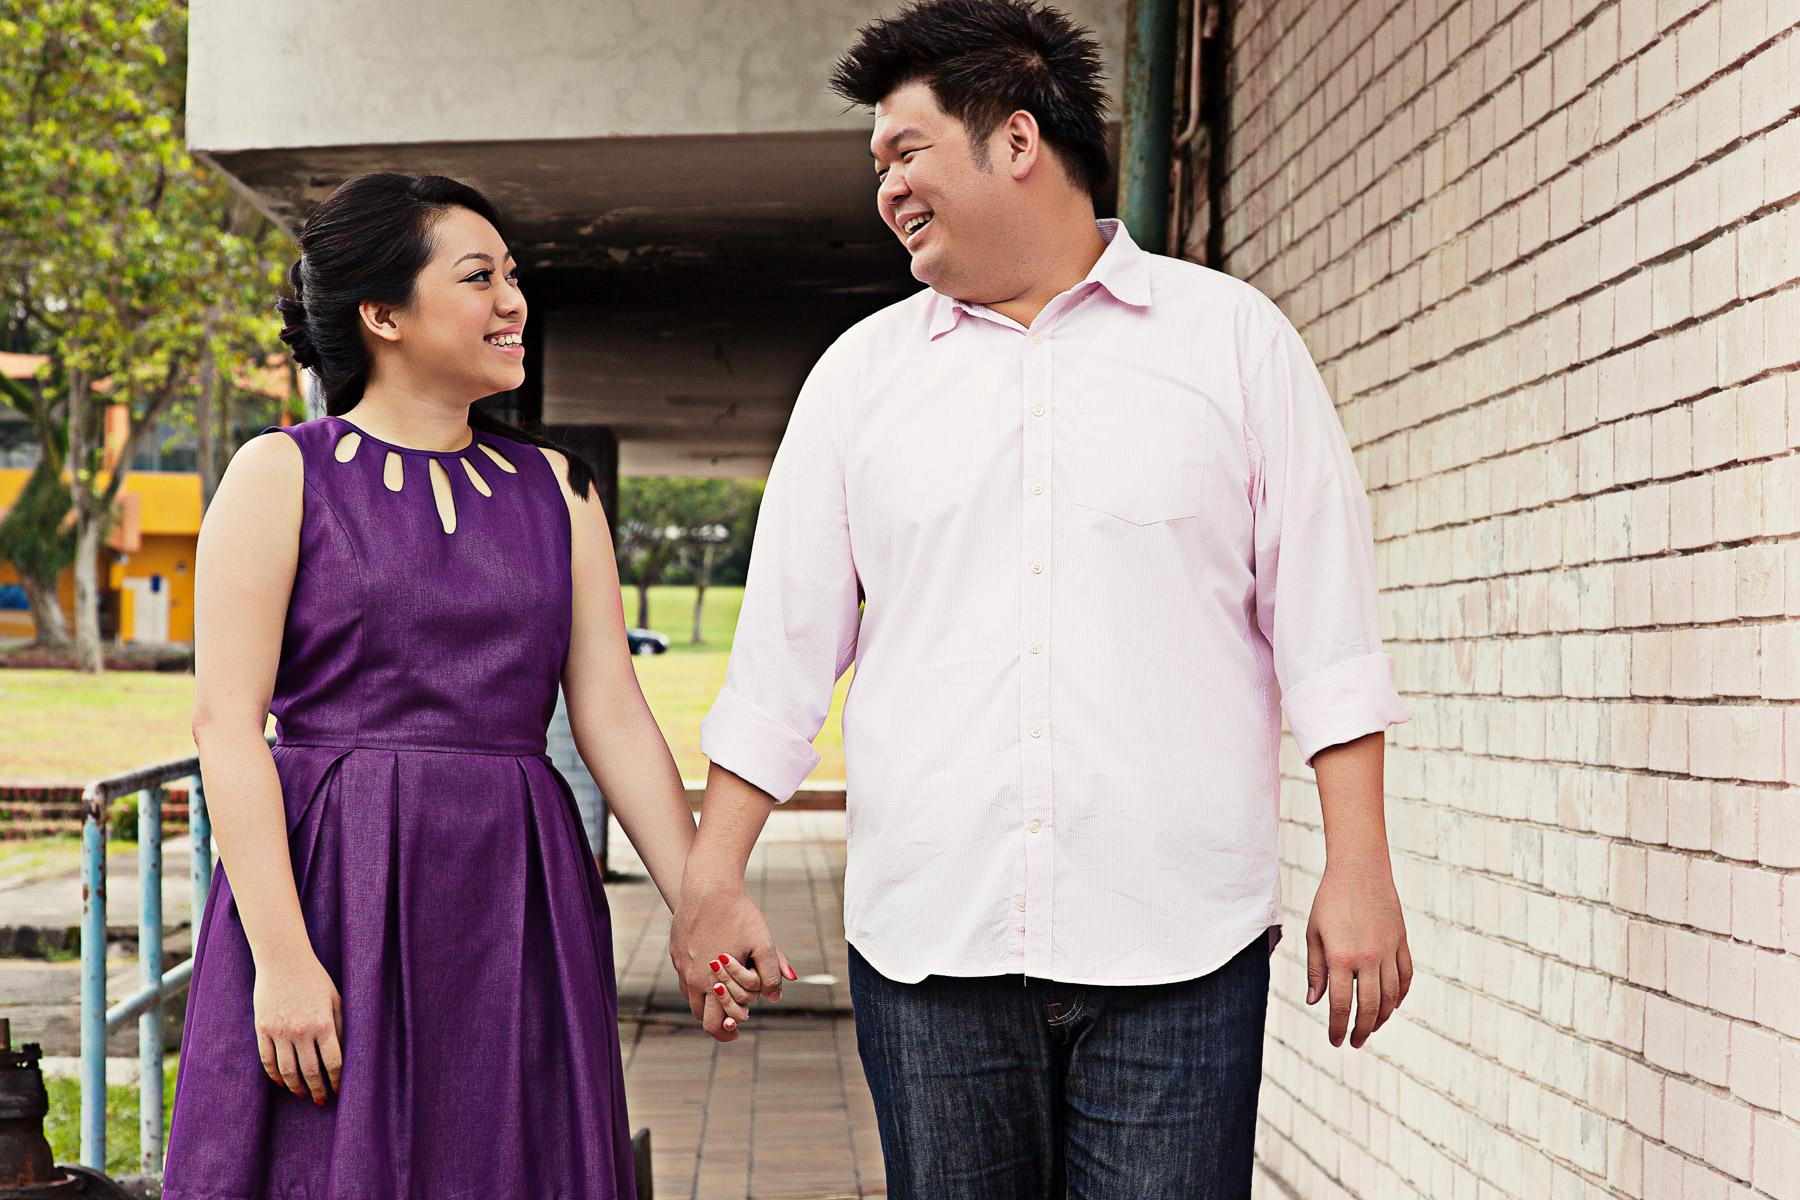 Joanna & Victors Portraits Singapore 01.jpg